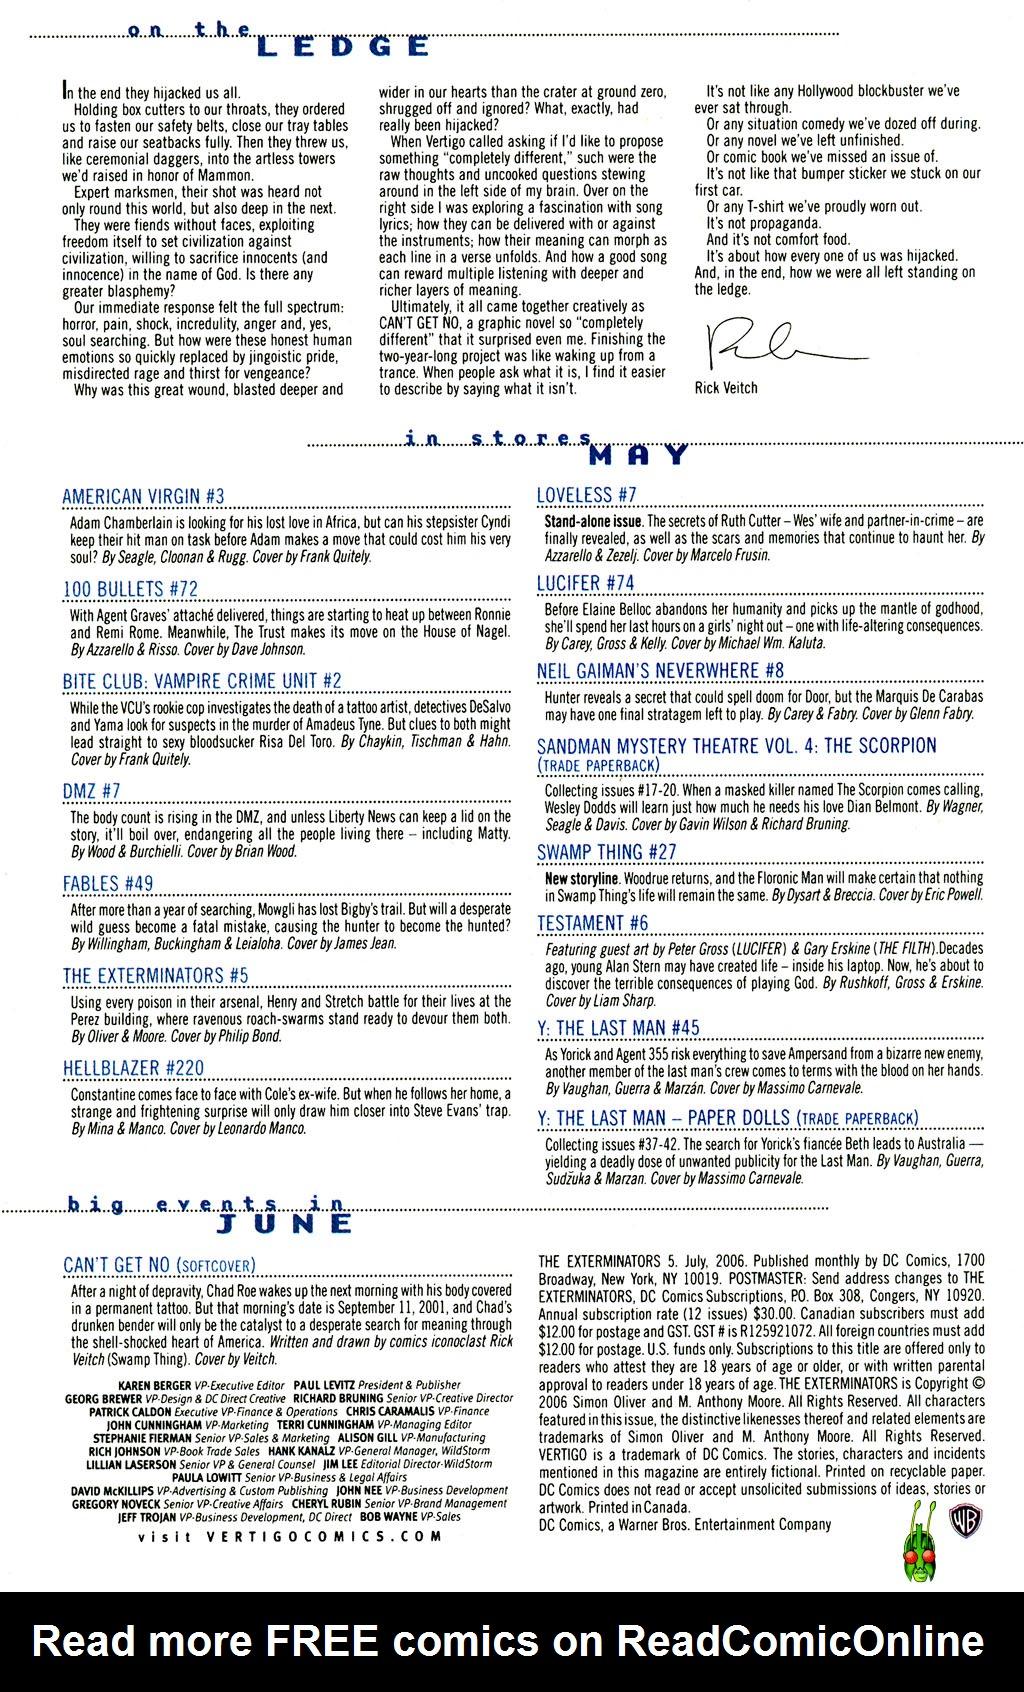 Read online The Exterminators comic -  Issue #5 - 24